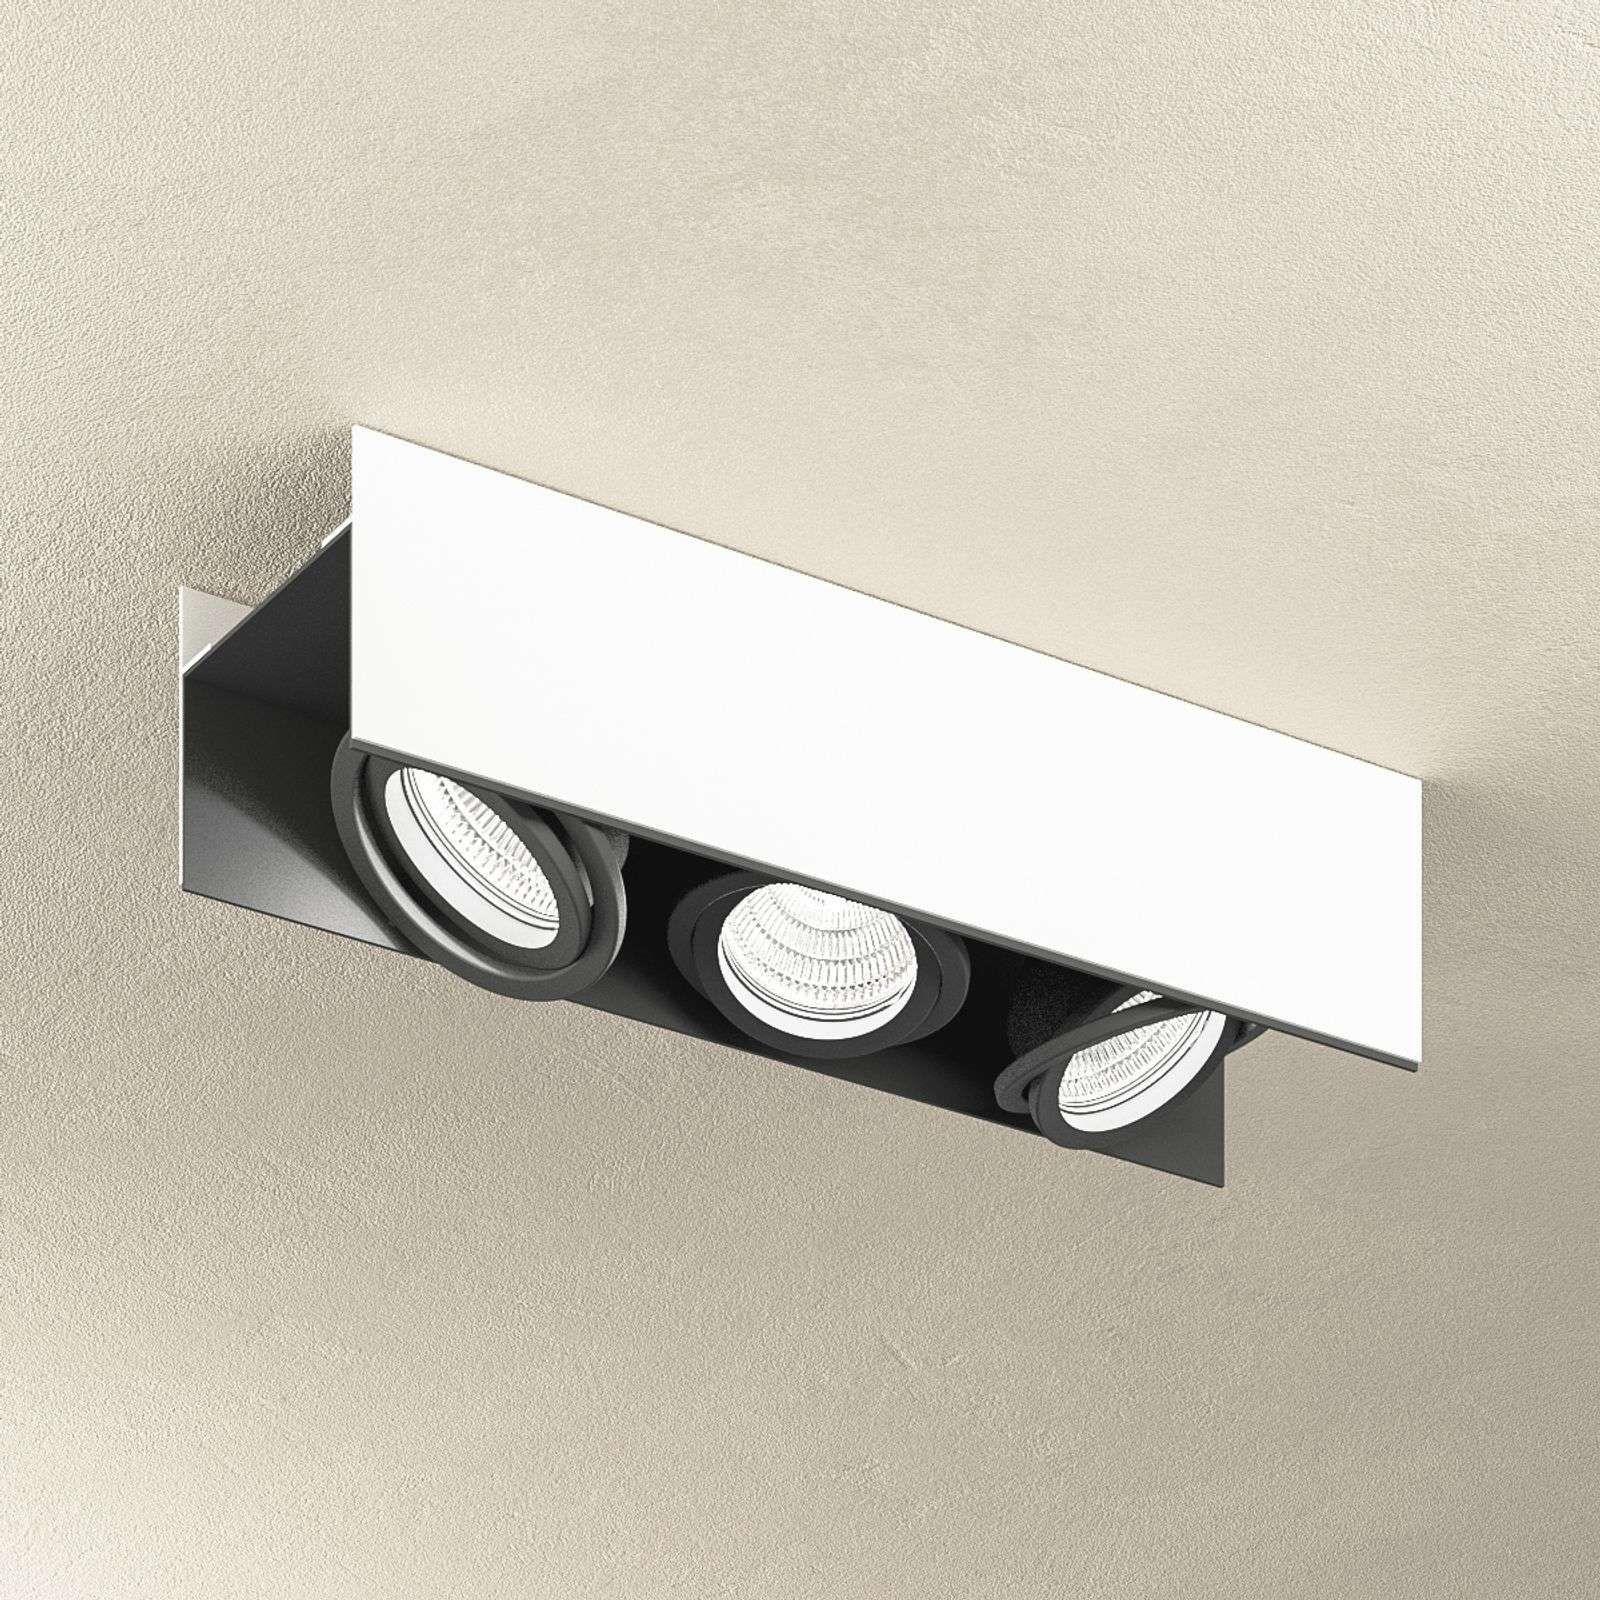 Plafonnier Avec Spots Led A 3 Lampes Vidago En 2020 Spot Plafond Plafonnier Led Plafond